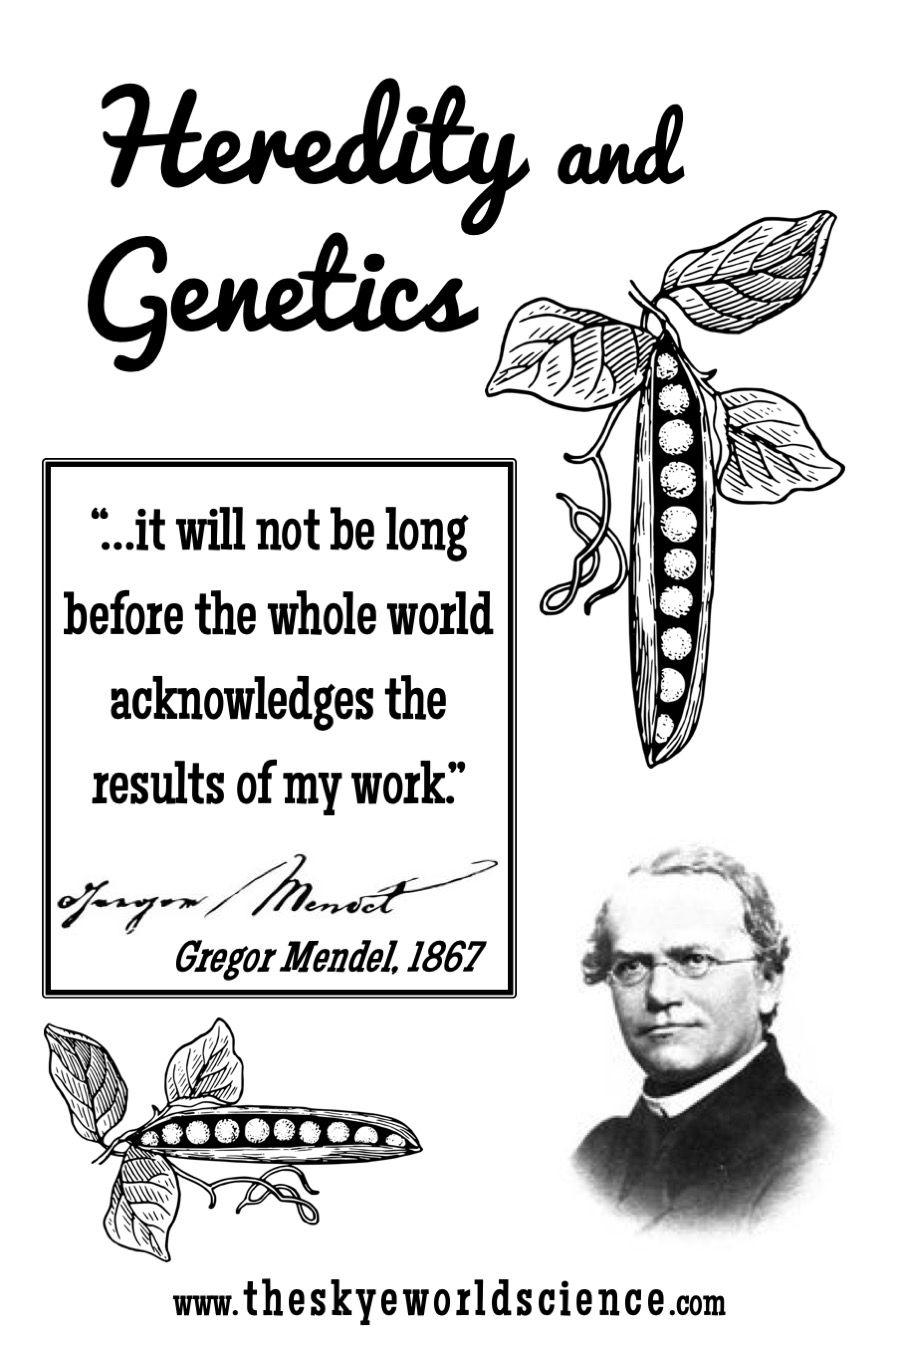 Classical Genetics Activities Persuasive Writing Prompts Genetics Lesson Teaching Biology Activities